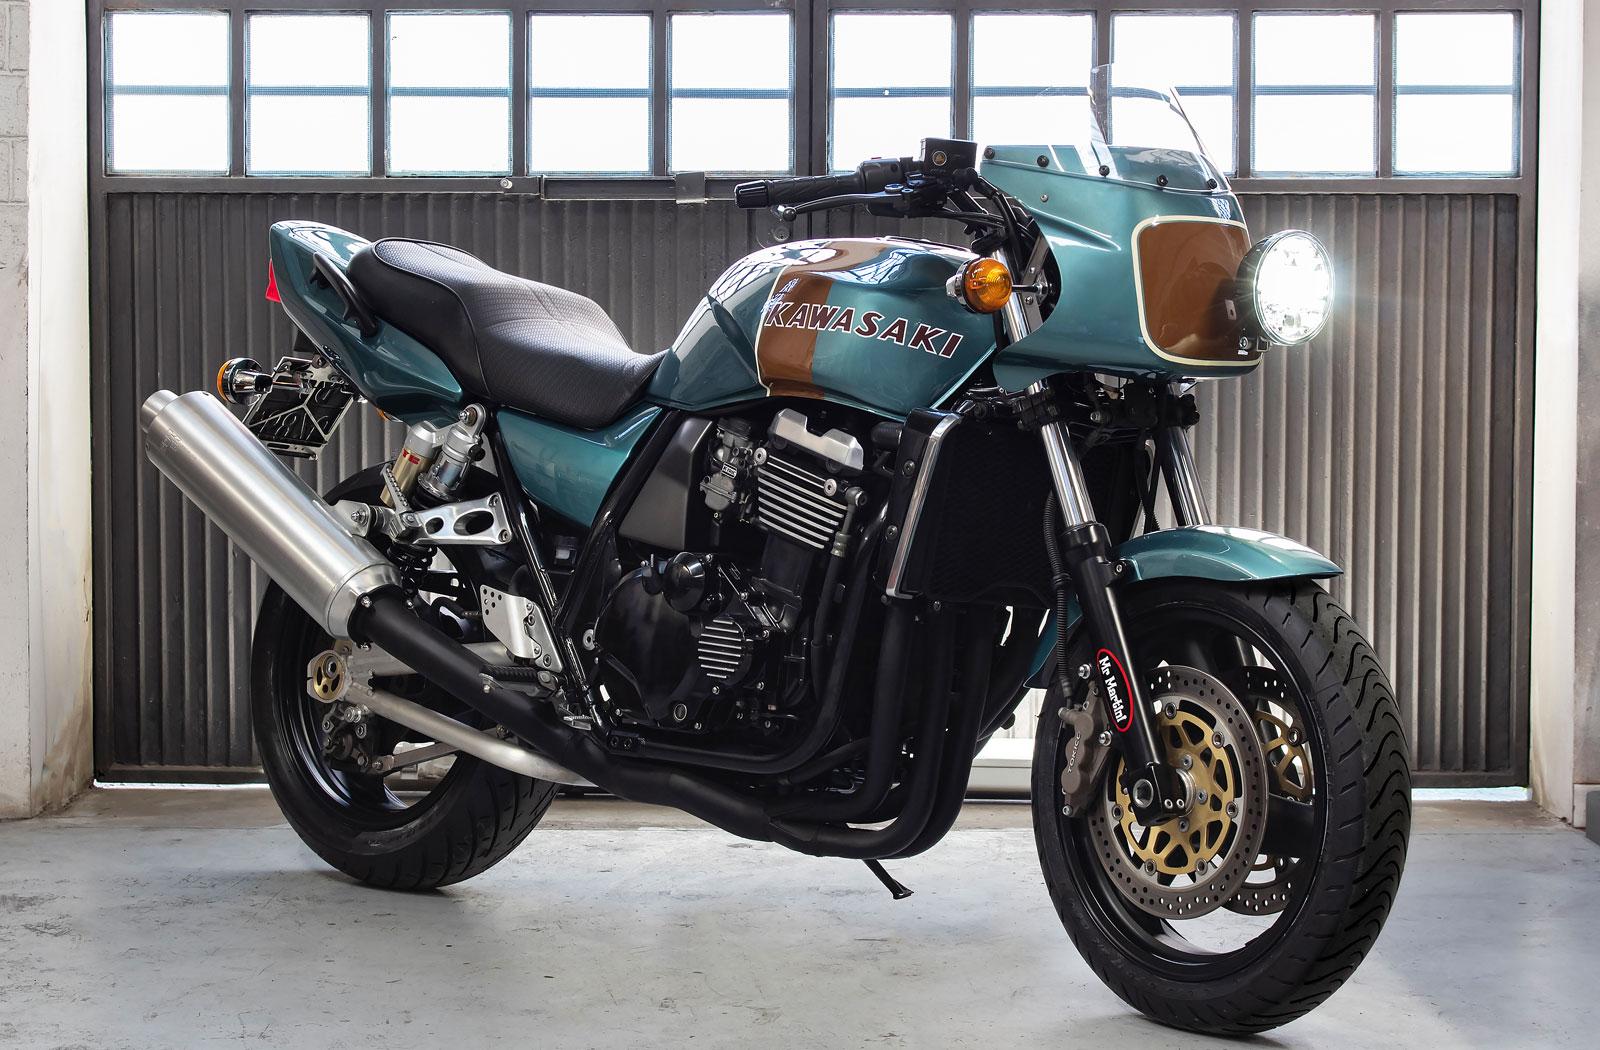 Kawasaki ZXR 1100 retro motorcycle